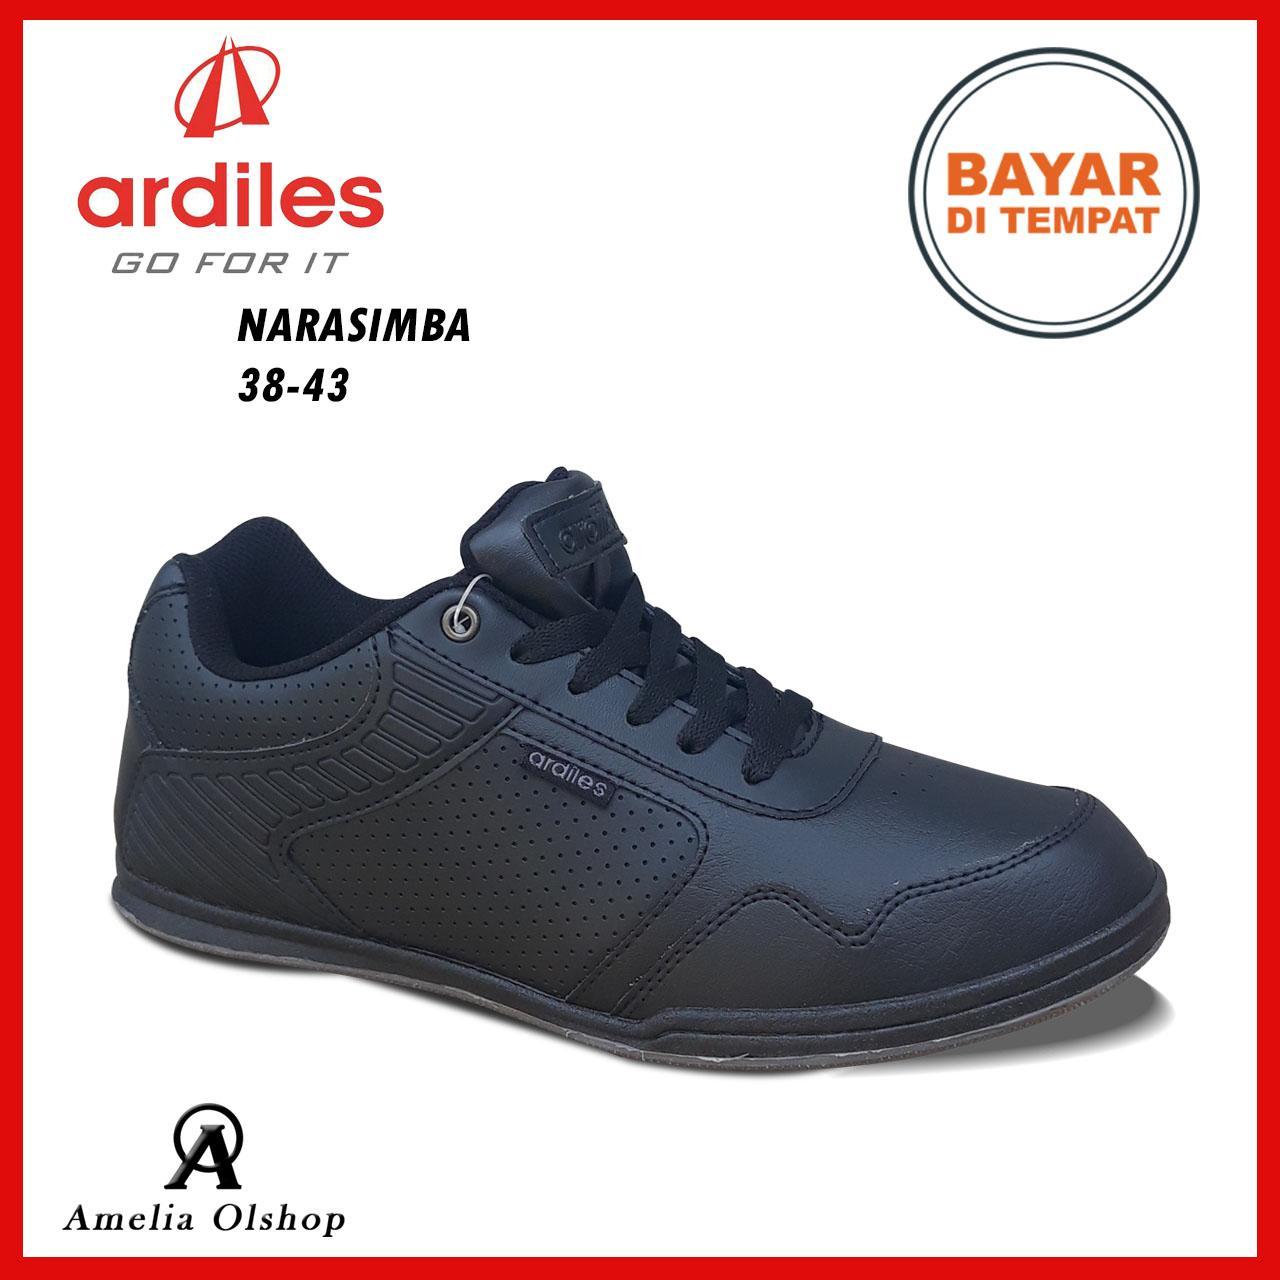 Features Amelia Olshop Sepatu Ardiles Narasimba 38 43 Sepatu Pria 60ed11cee0